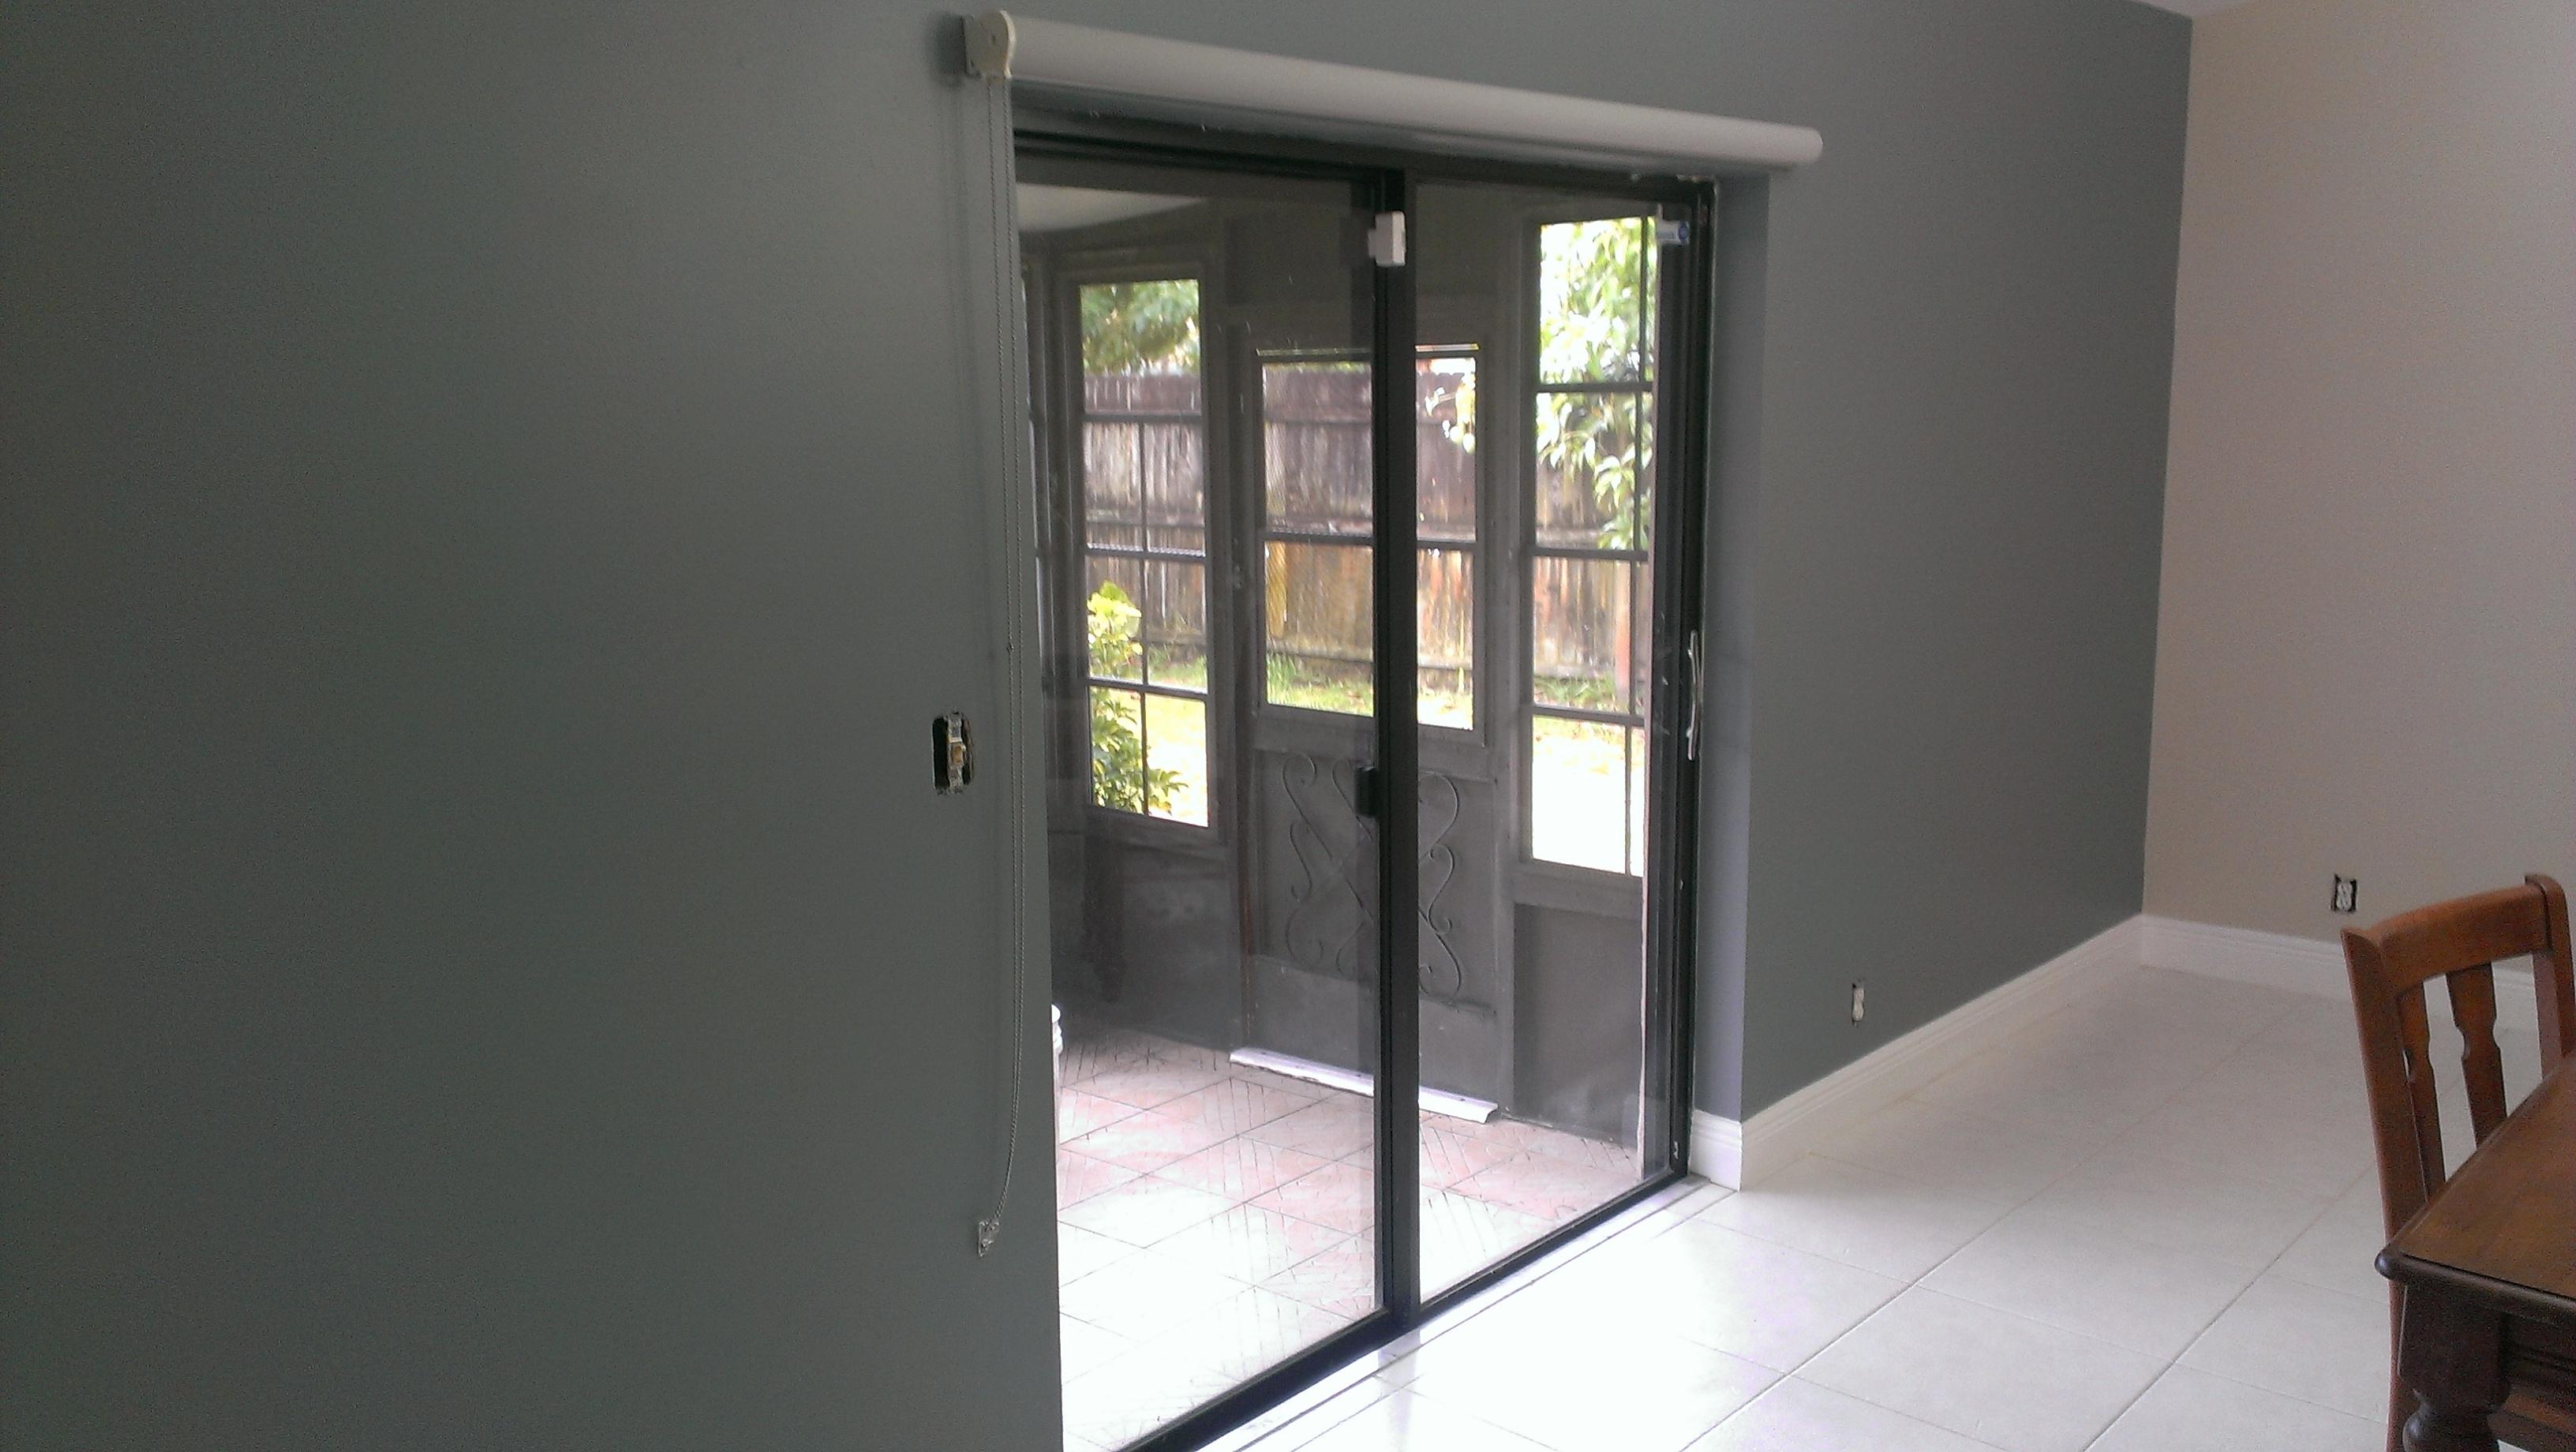 Roller Shades For Sliding Patio Doorsroller blinds for sliding glass doors sliding doors ideas